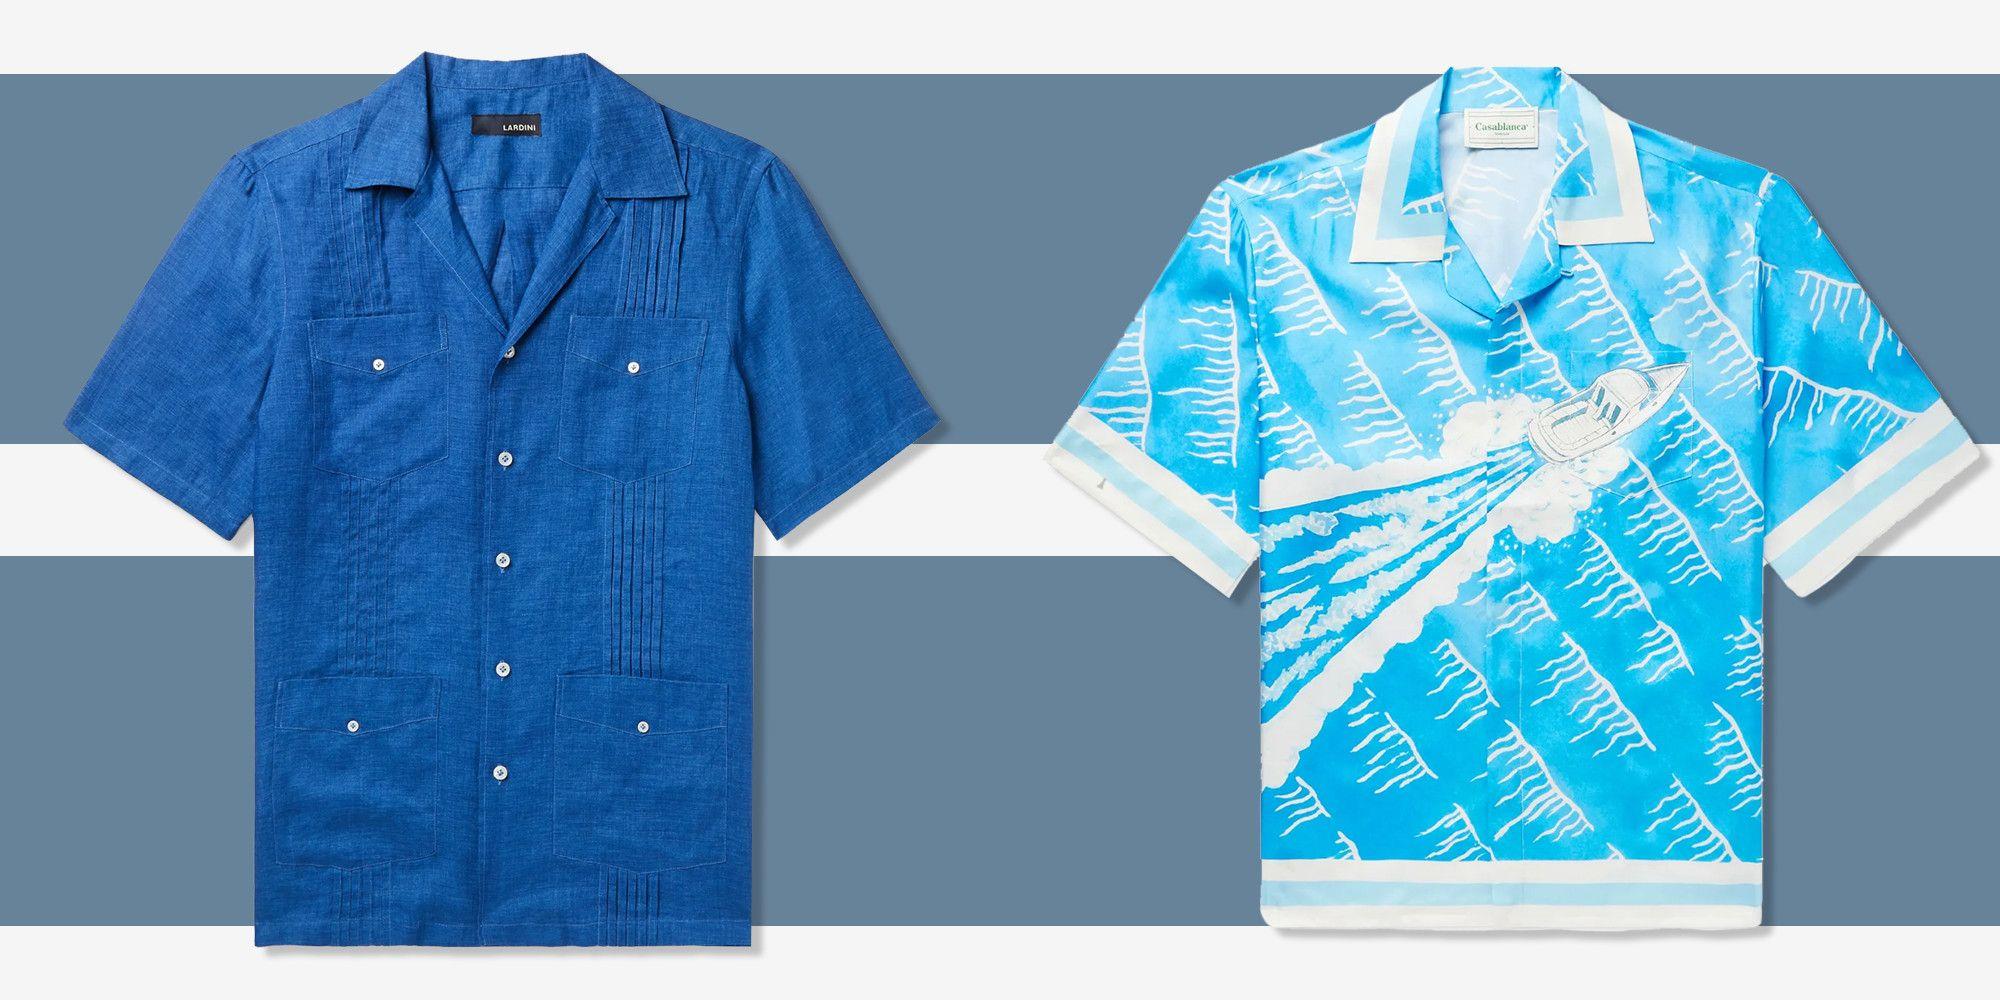 The 10 Best Short Sleeve Summer Shirts for Men 2020 Best